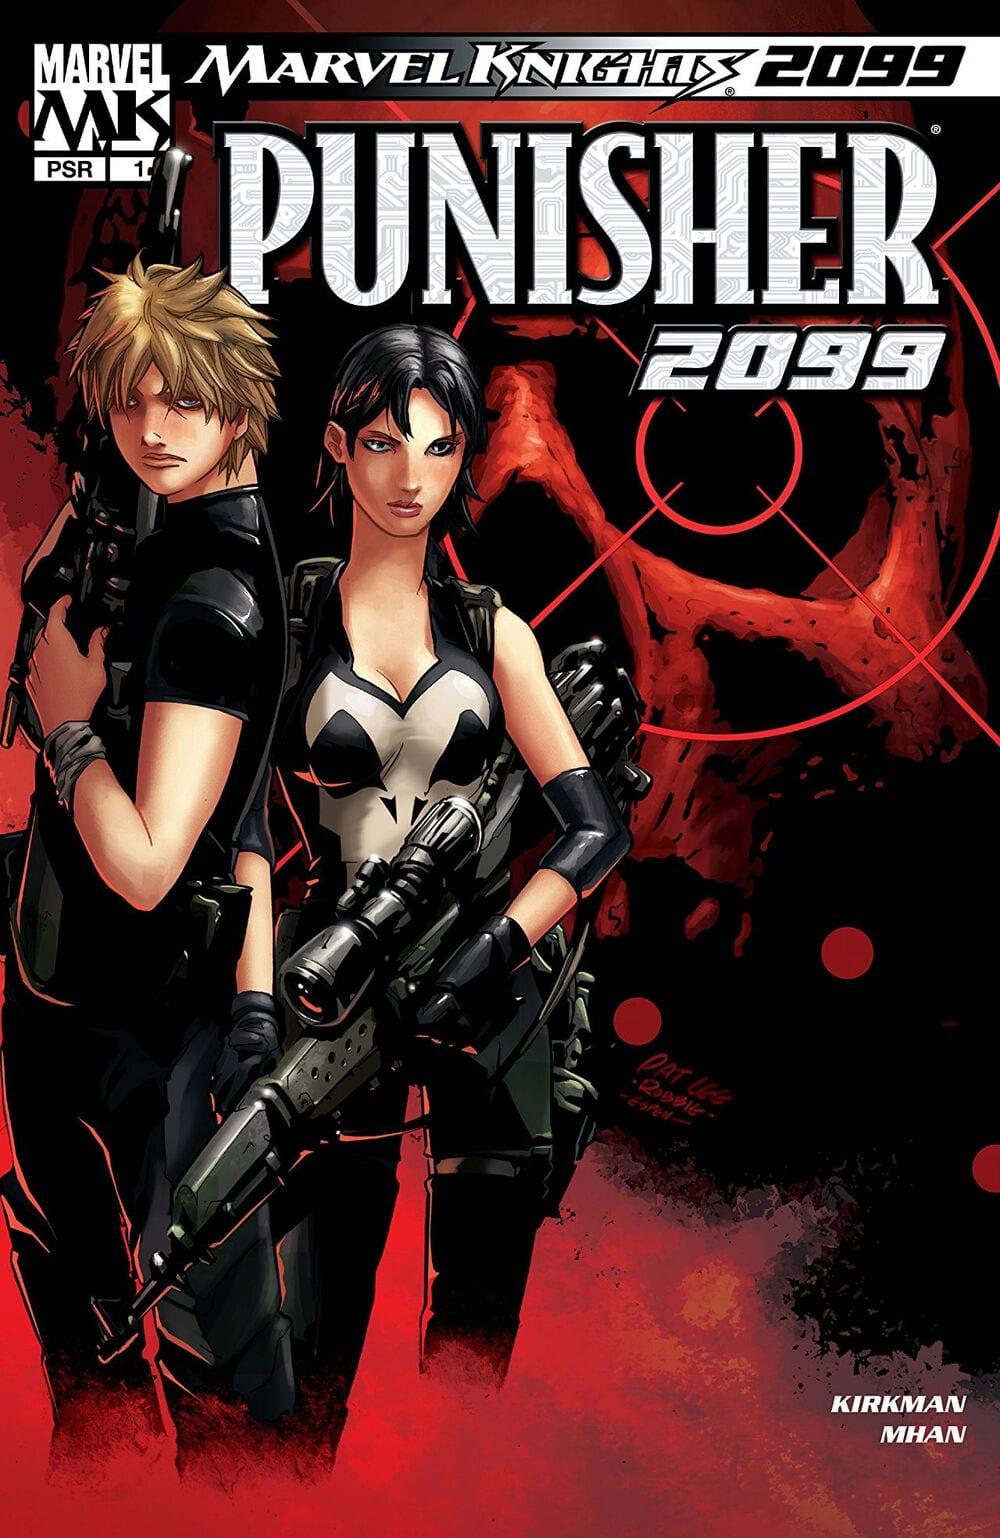 Comic completo Punisher 2099 Volumen 2